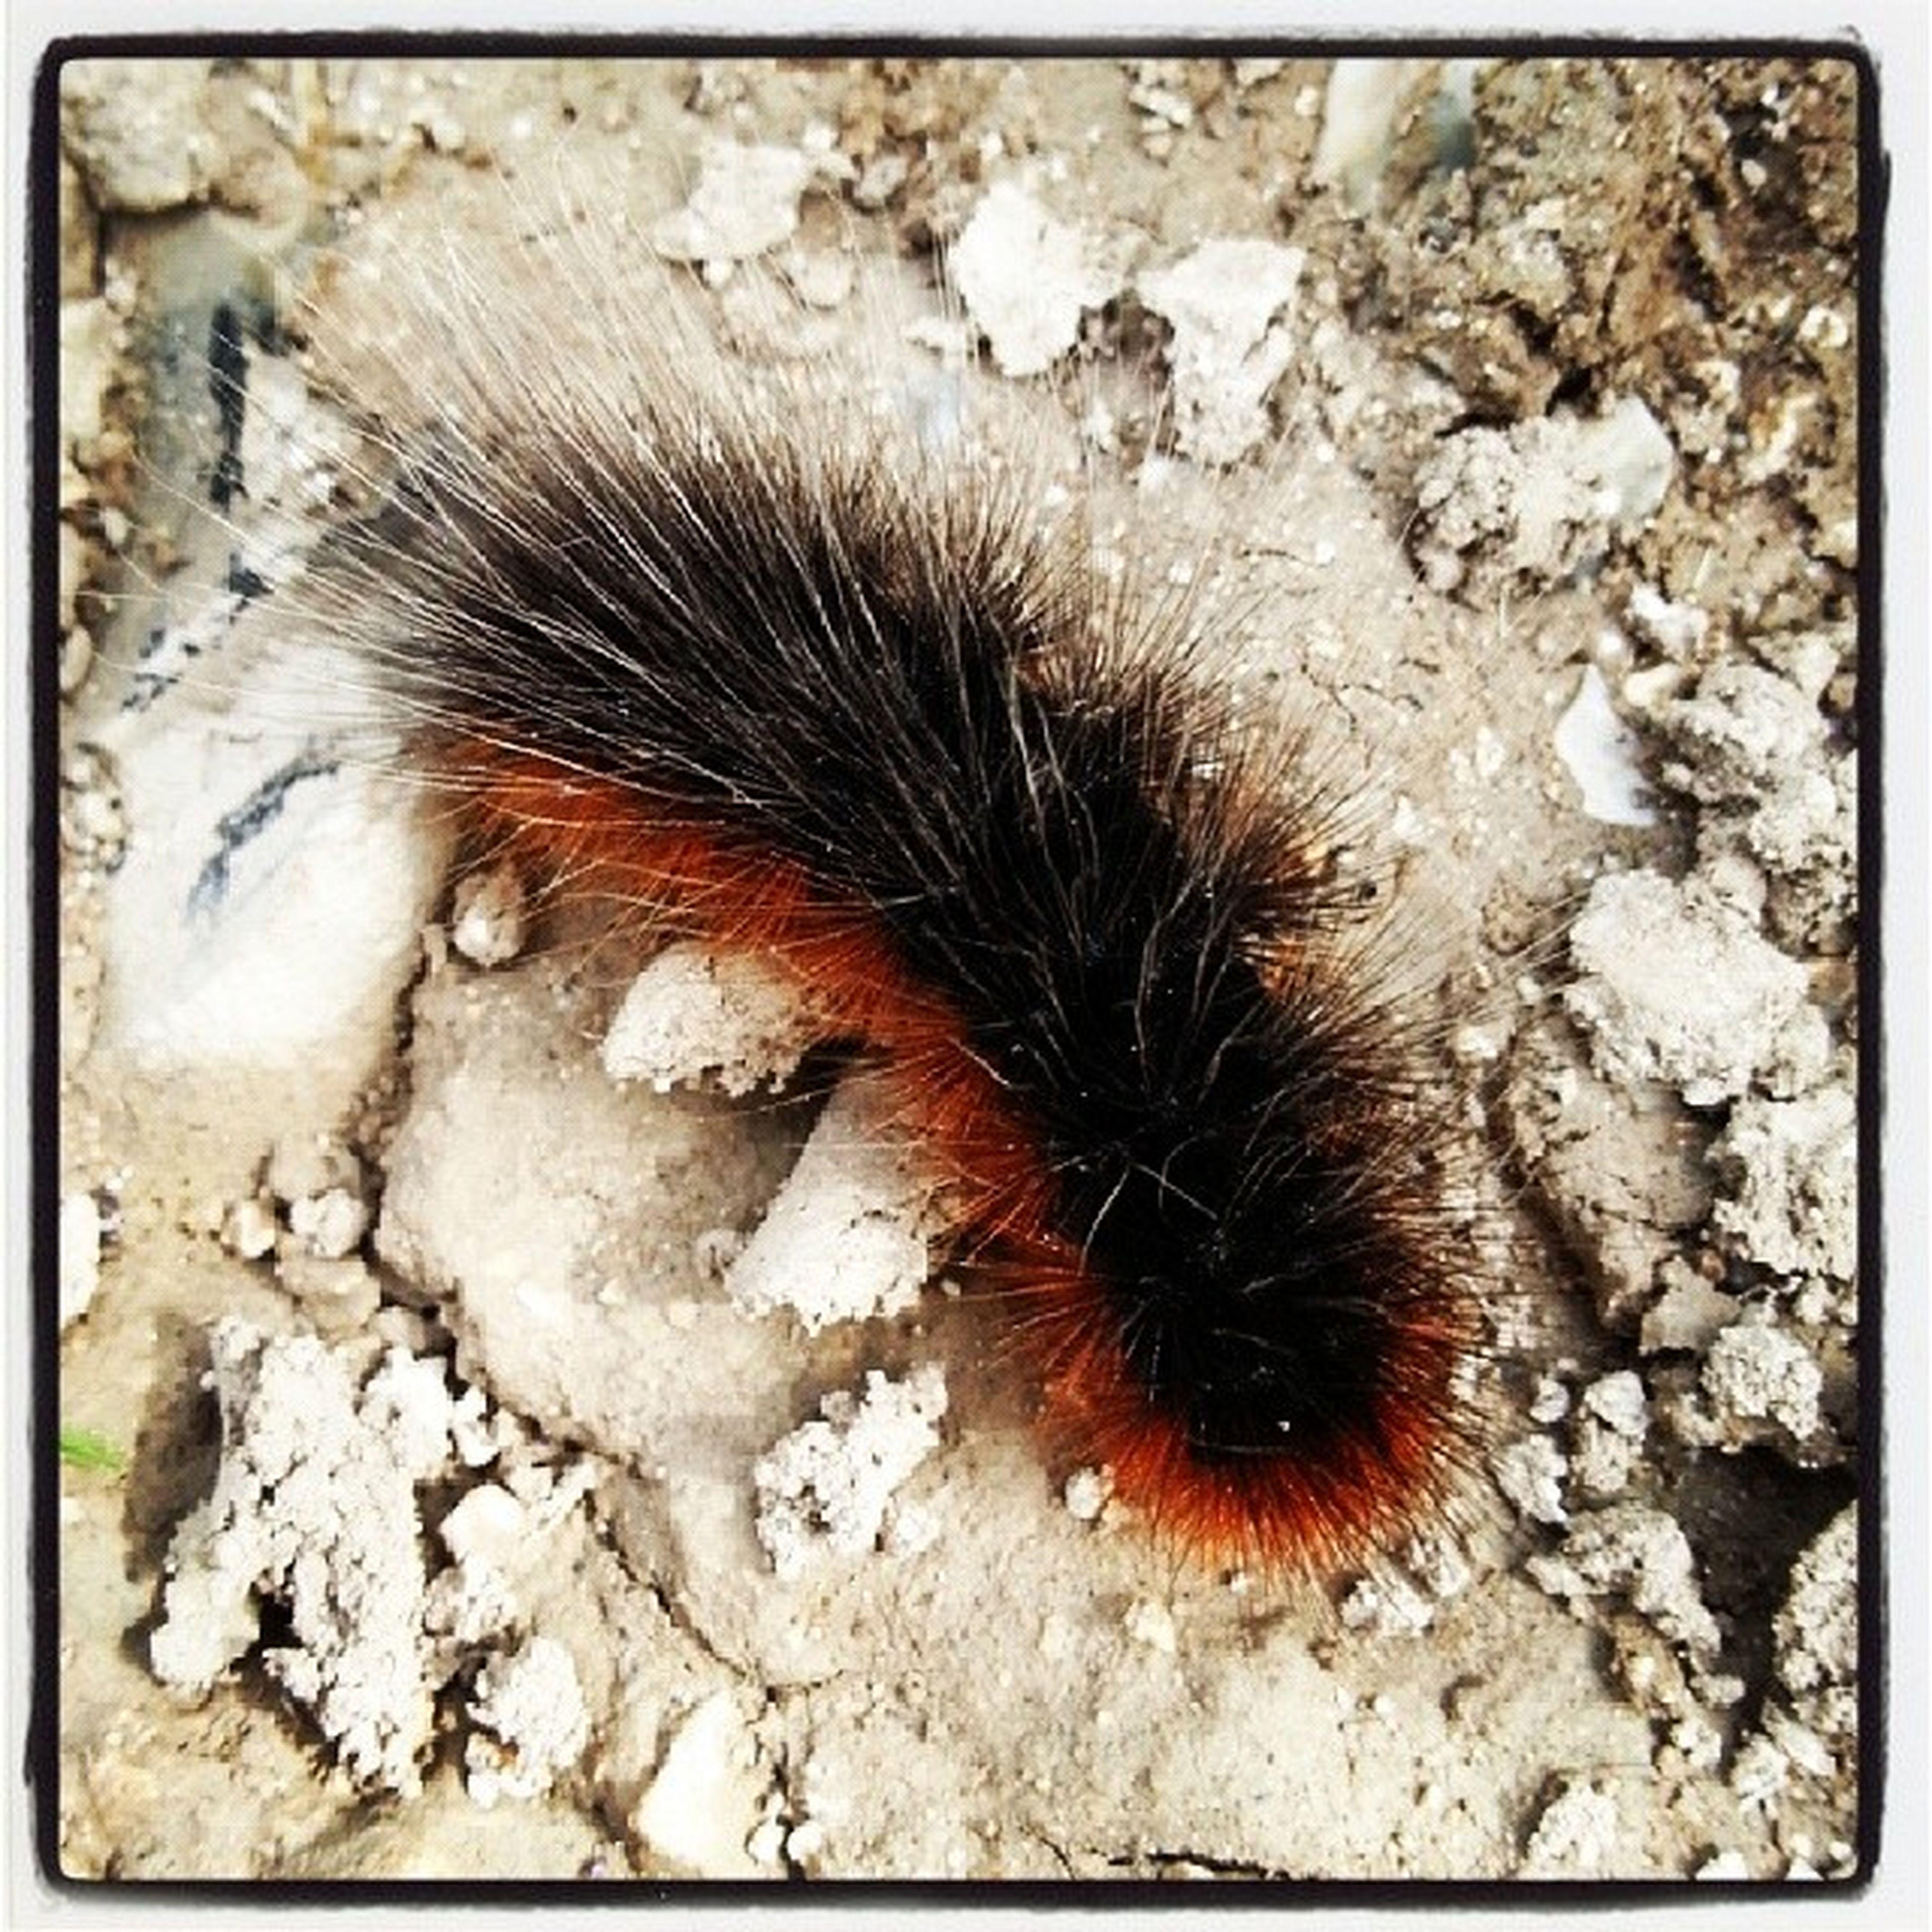 Hairy  Caterpillar Hairycaterpillar Walkingwiltshire walking findingcreatures